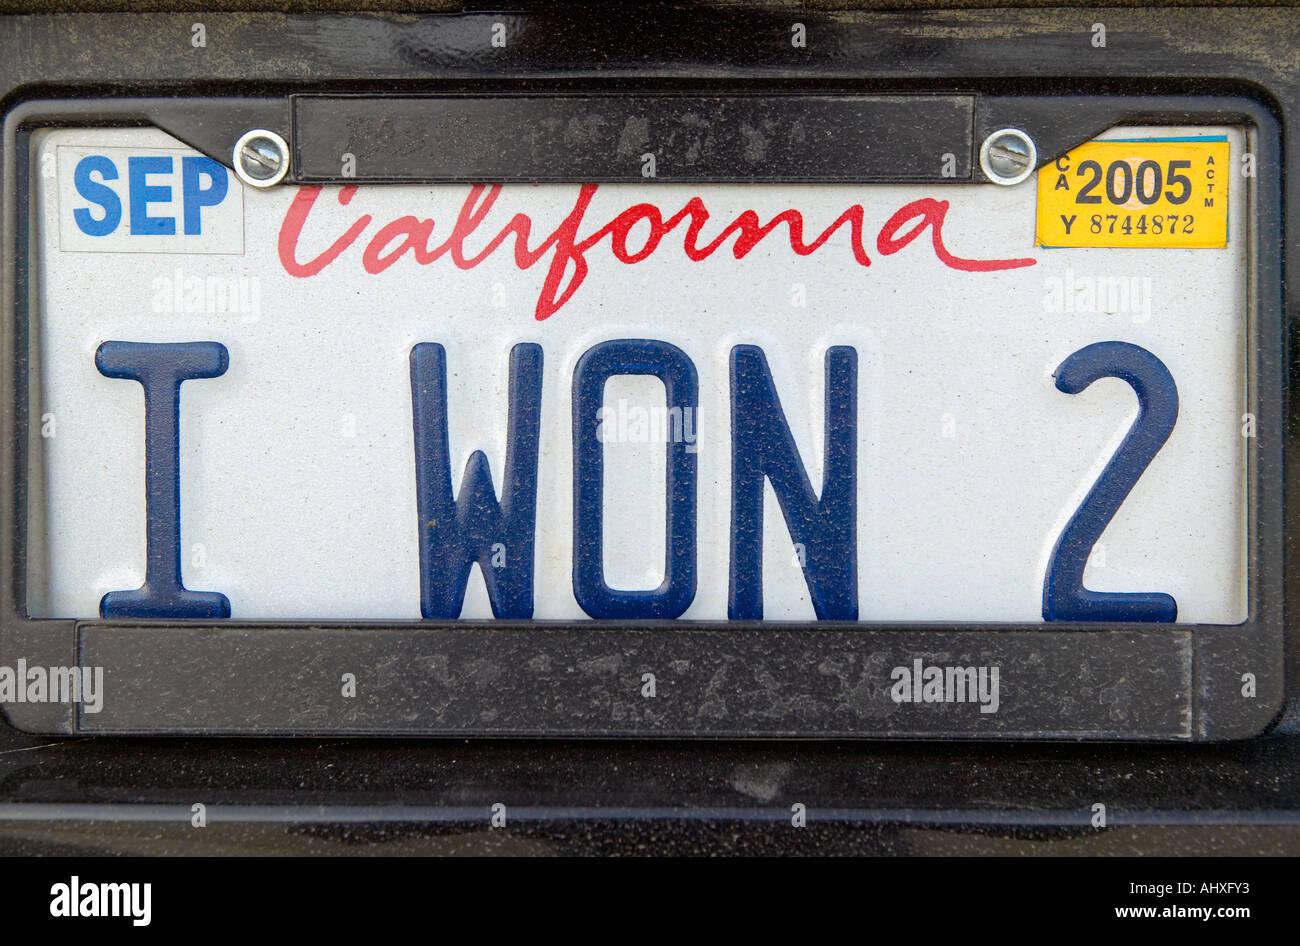 California License Plate Stockfotos & California License Plate ...